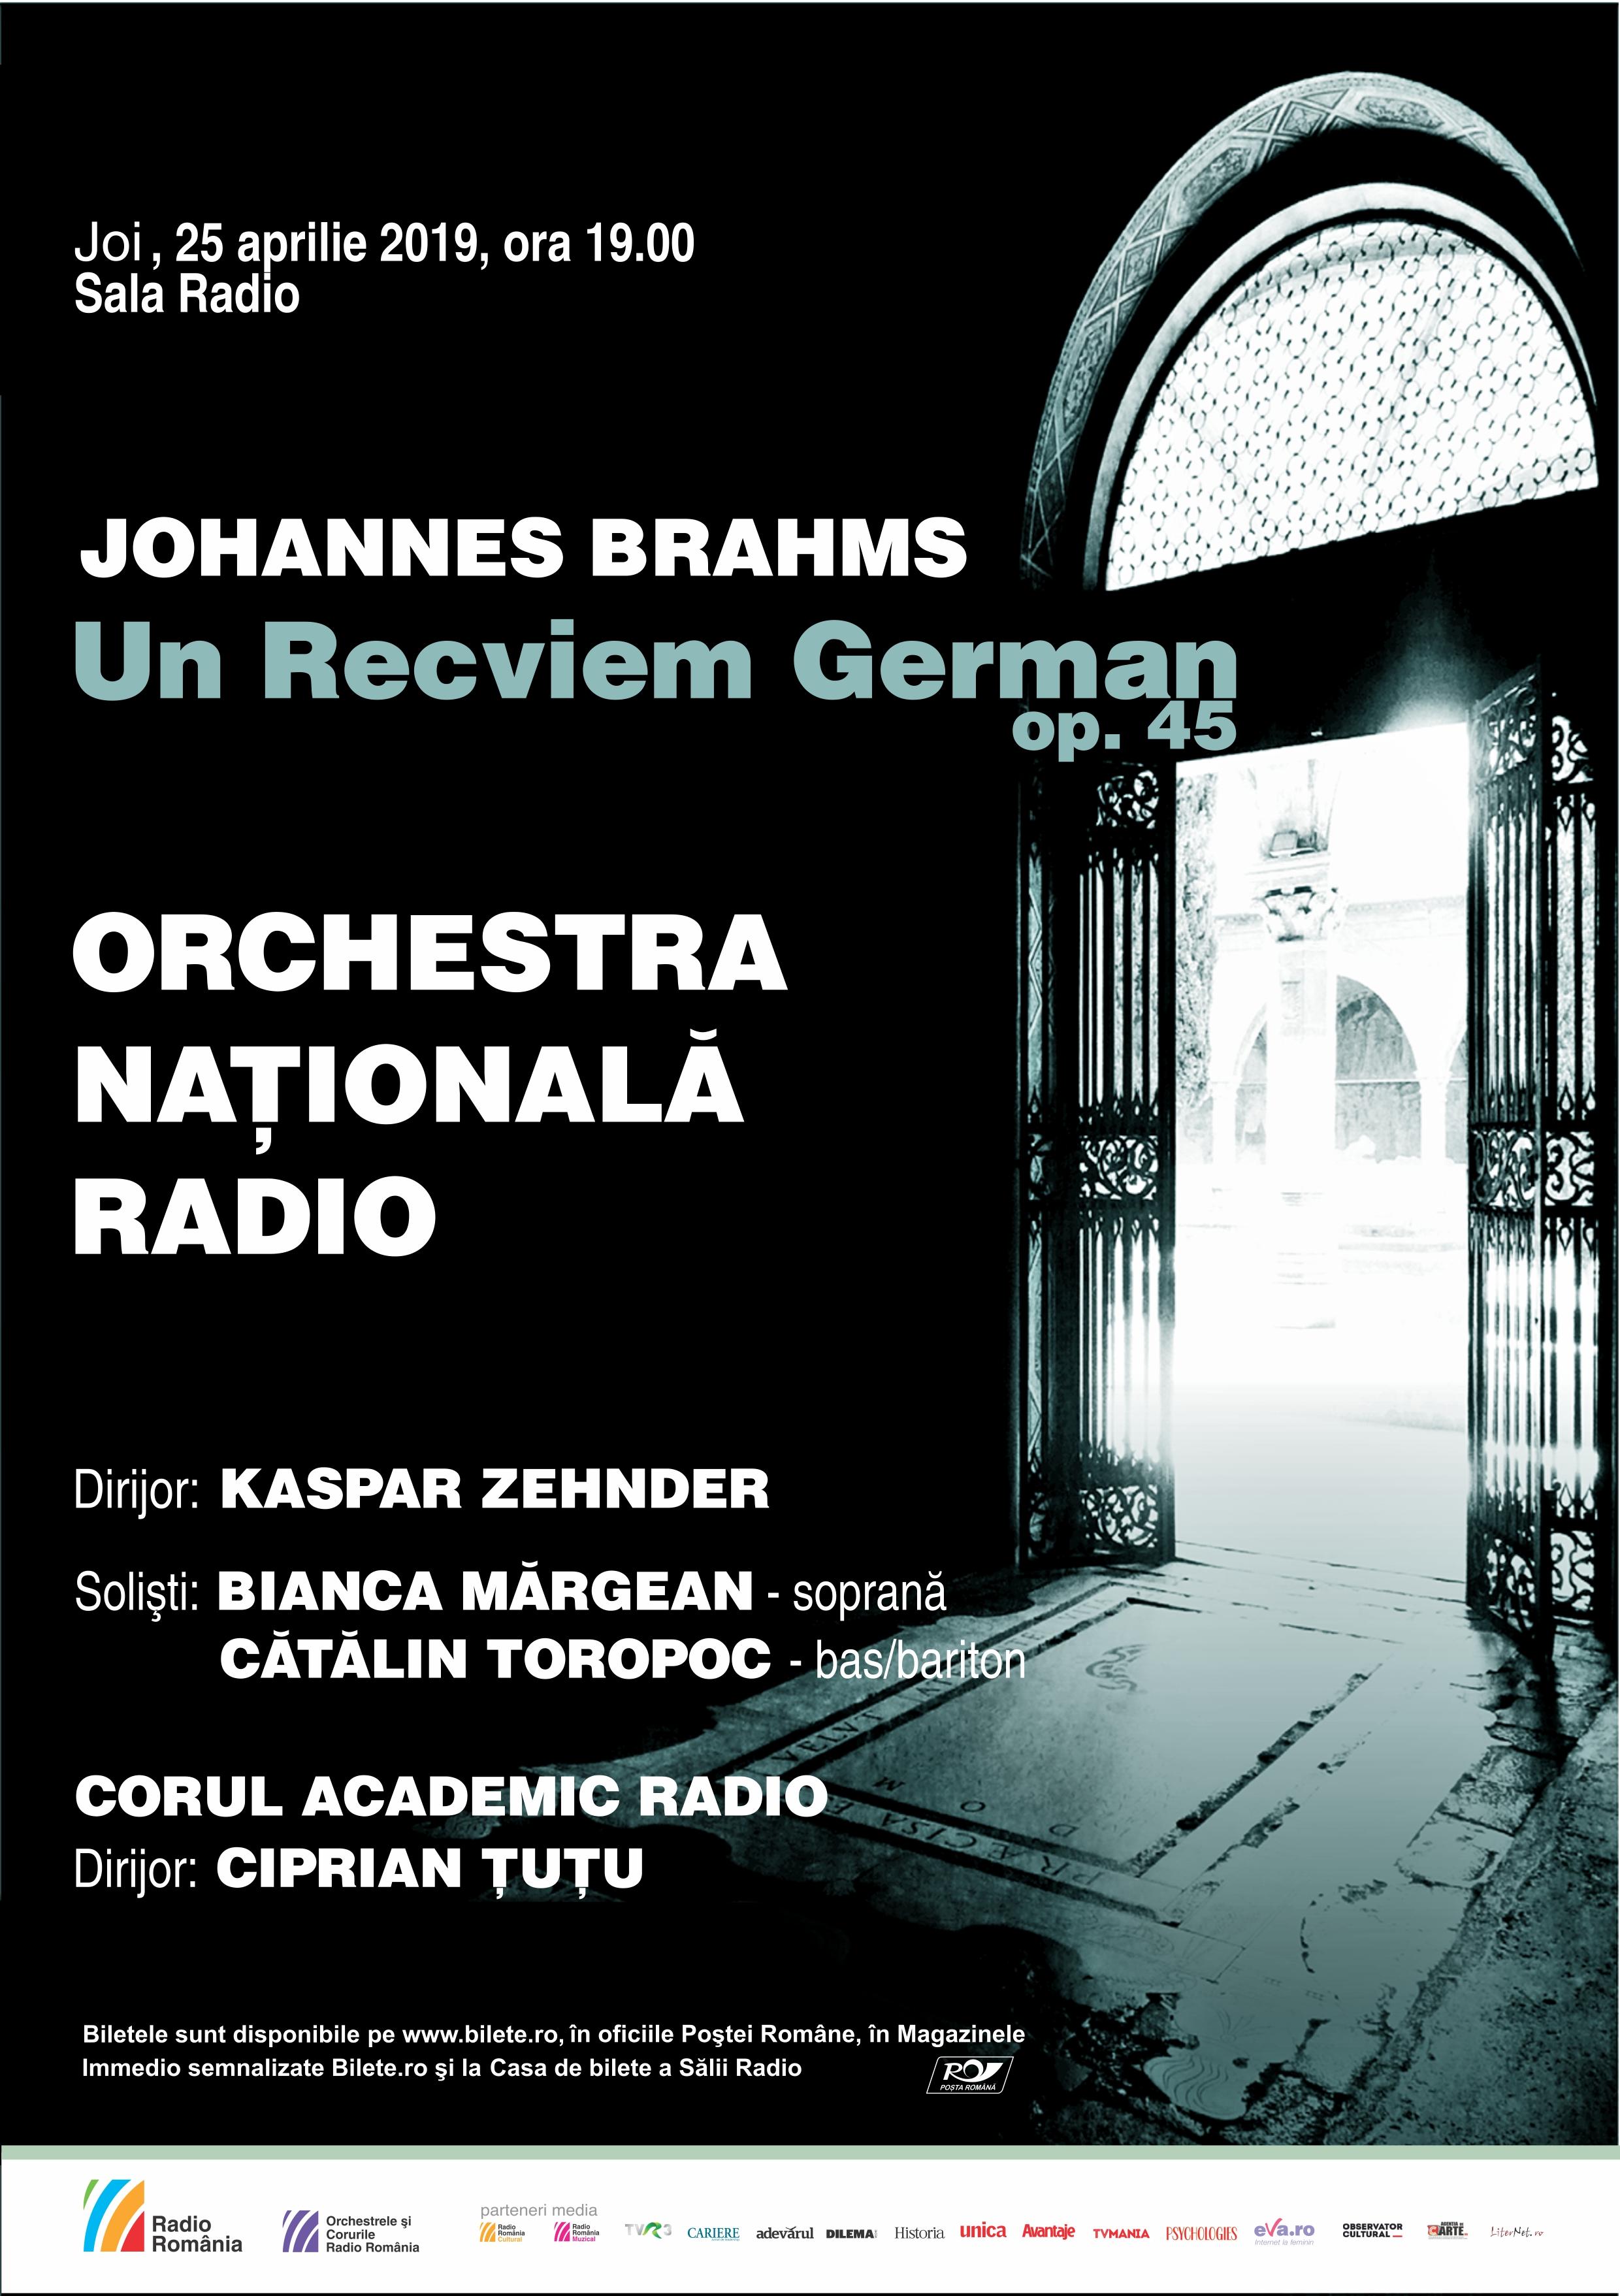 Brahms – Recviem – ORCHESTRA NAŢIONALĂ RADIO